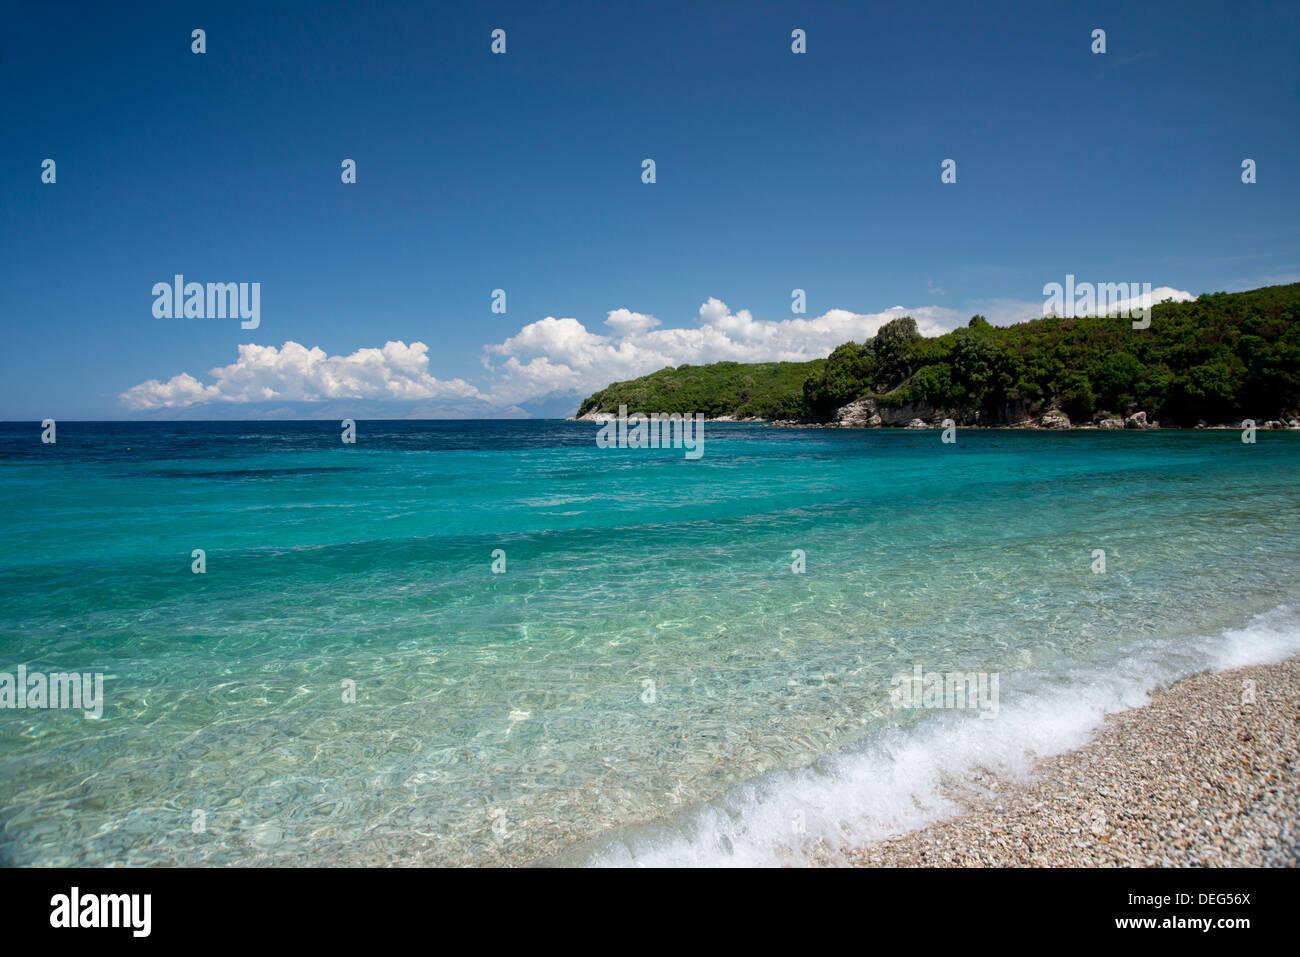 Avlaki Beach on the northeast coast of Corfu near the town of Cassiopi, Corfu, Ionian Islands, Greek Islands, Greece - Stock Image